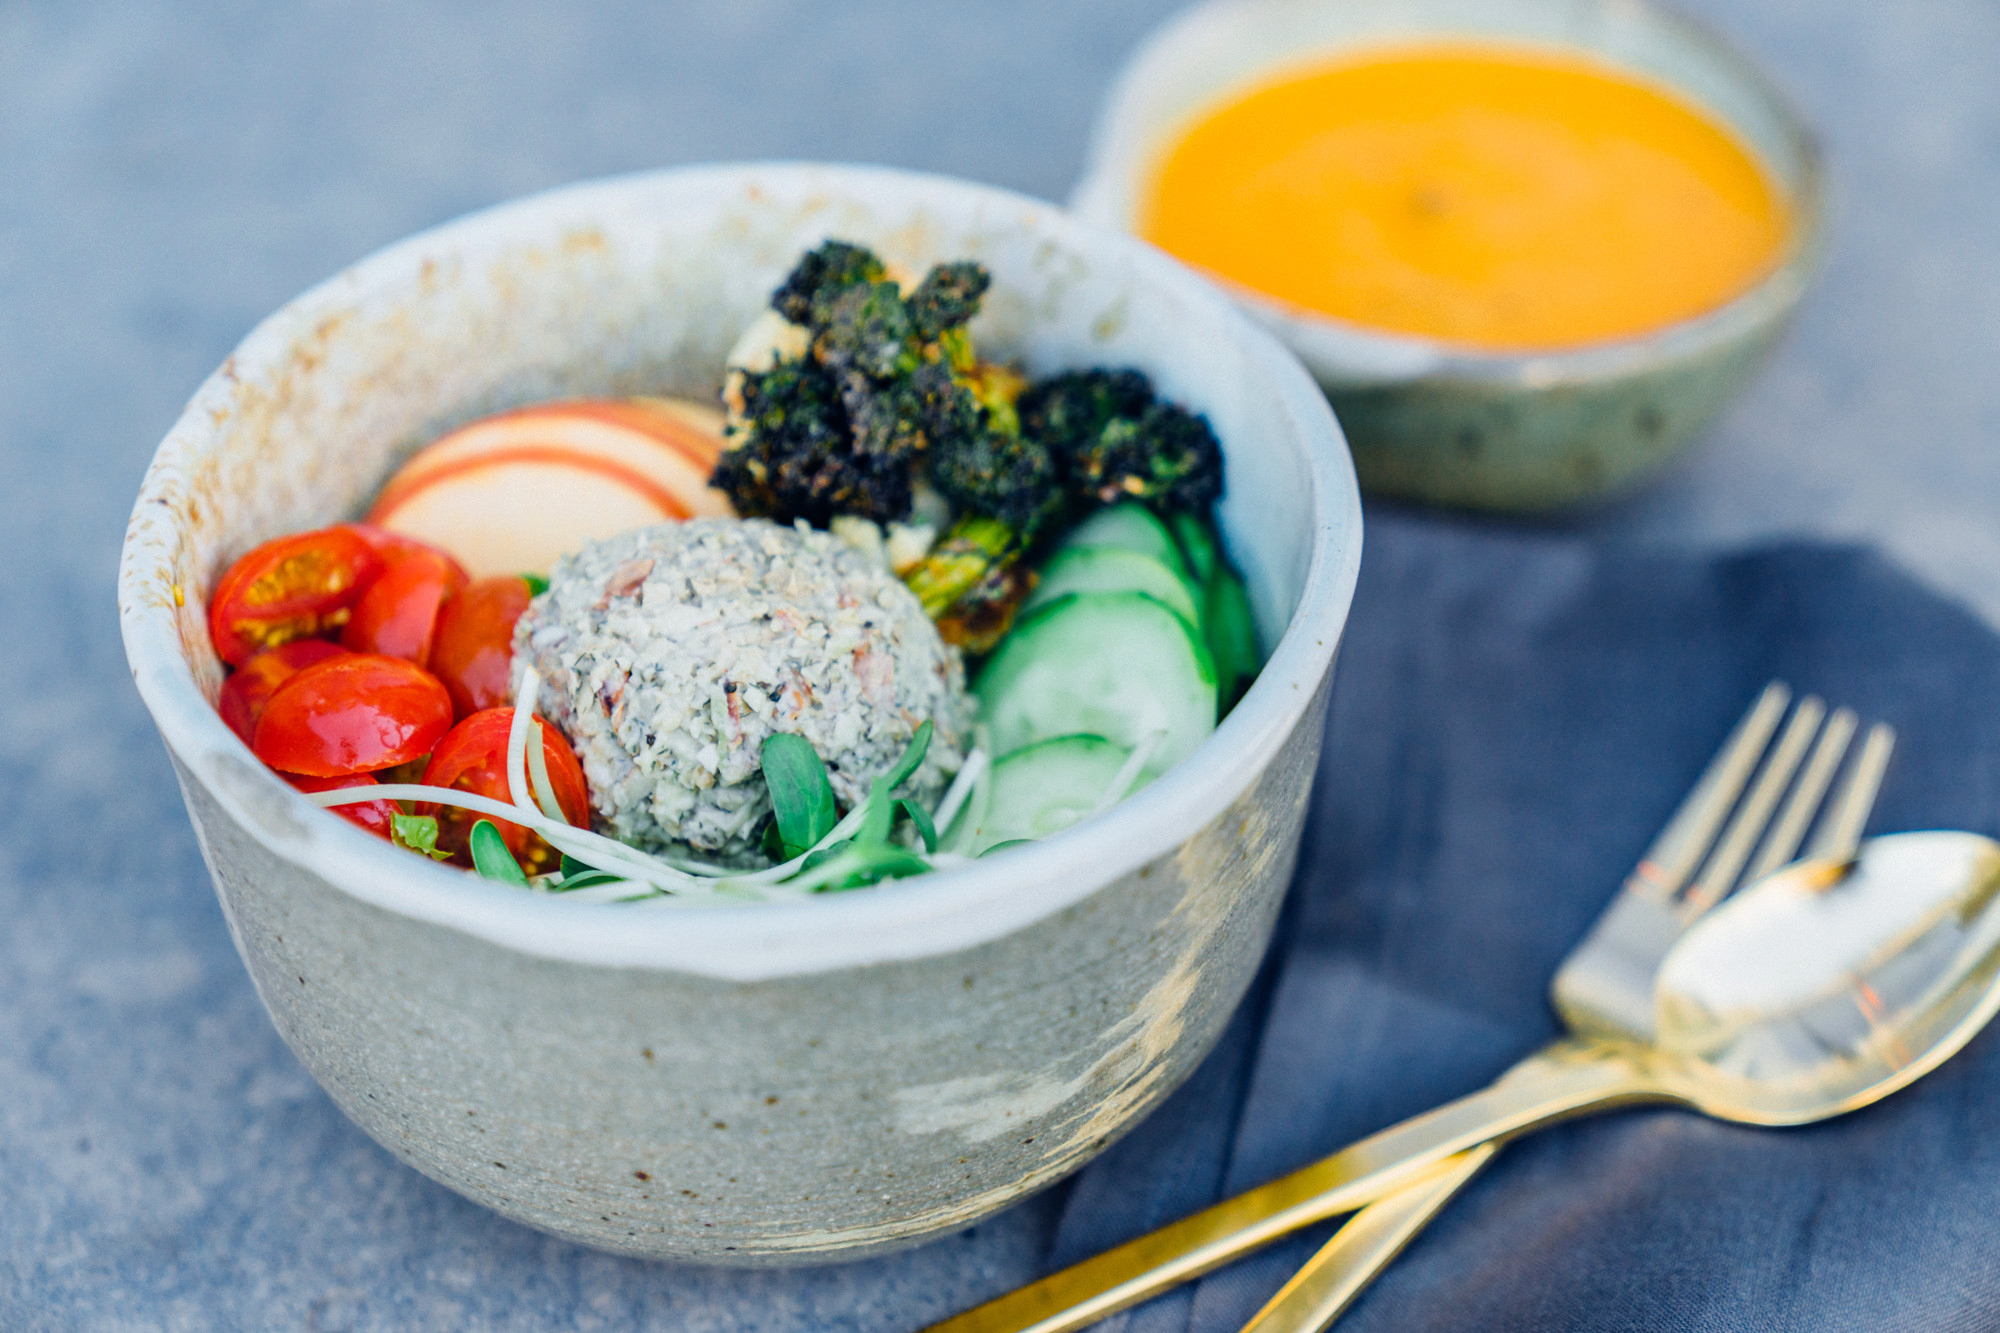 Theory-Foods-Nourish-Cafe-Salad-1.jpg